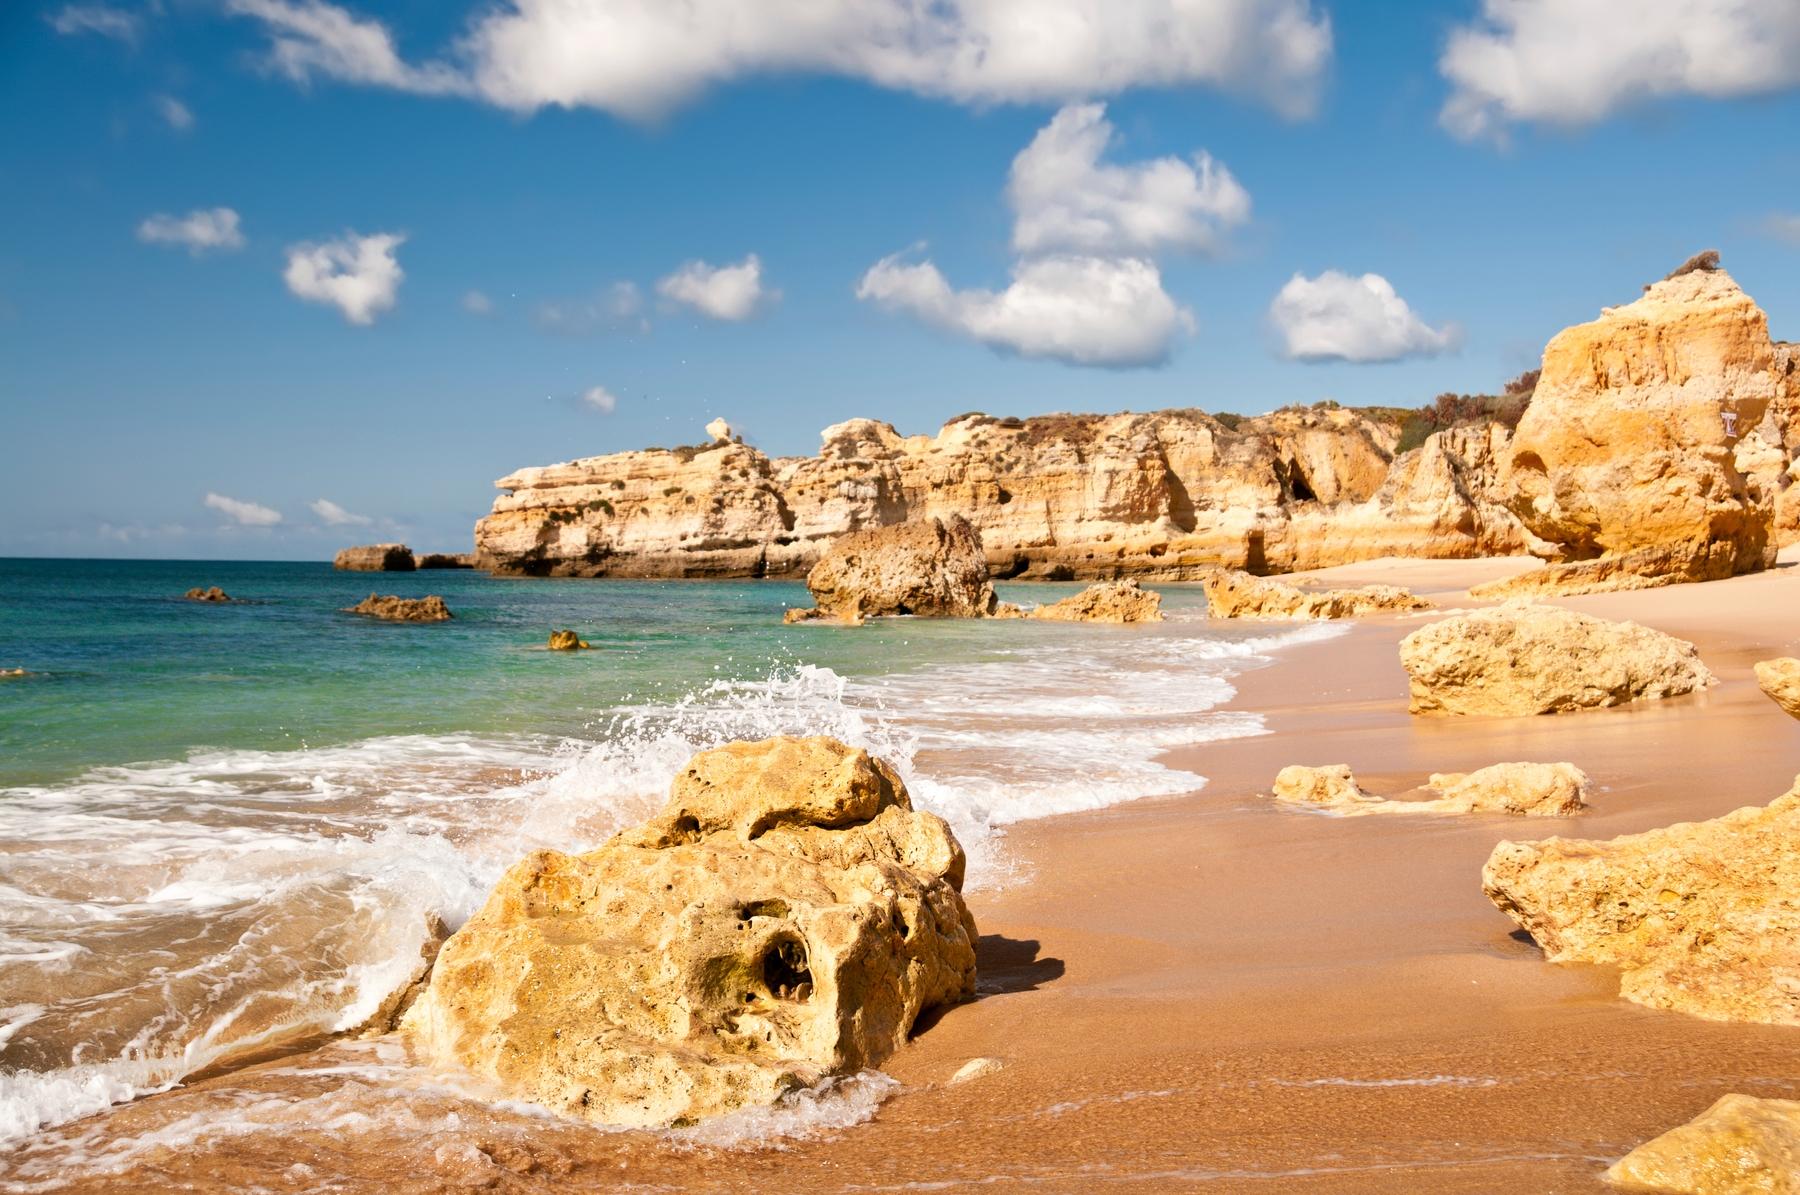 Sandy, empty beach linesd by sea cliffs in the Algarve Portugal.